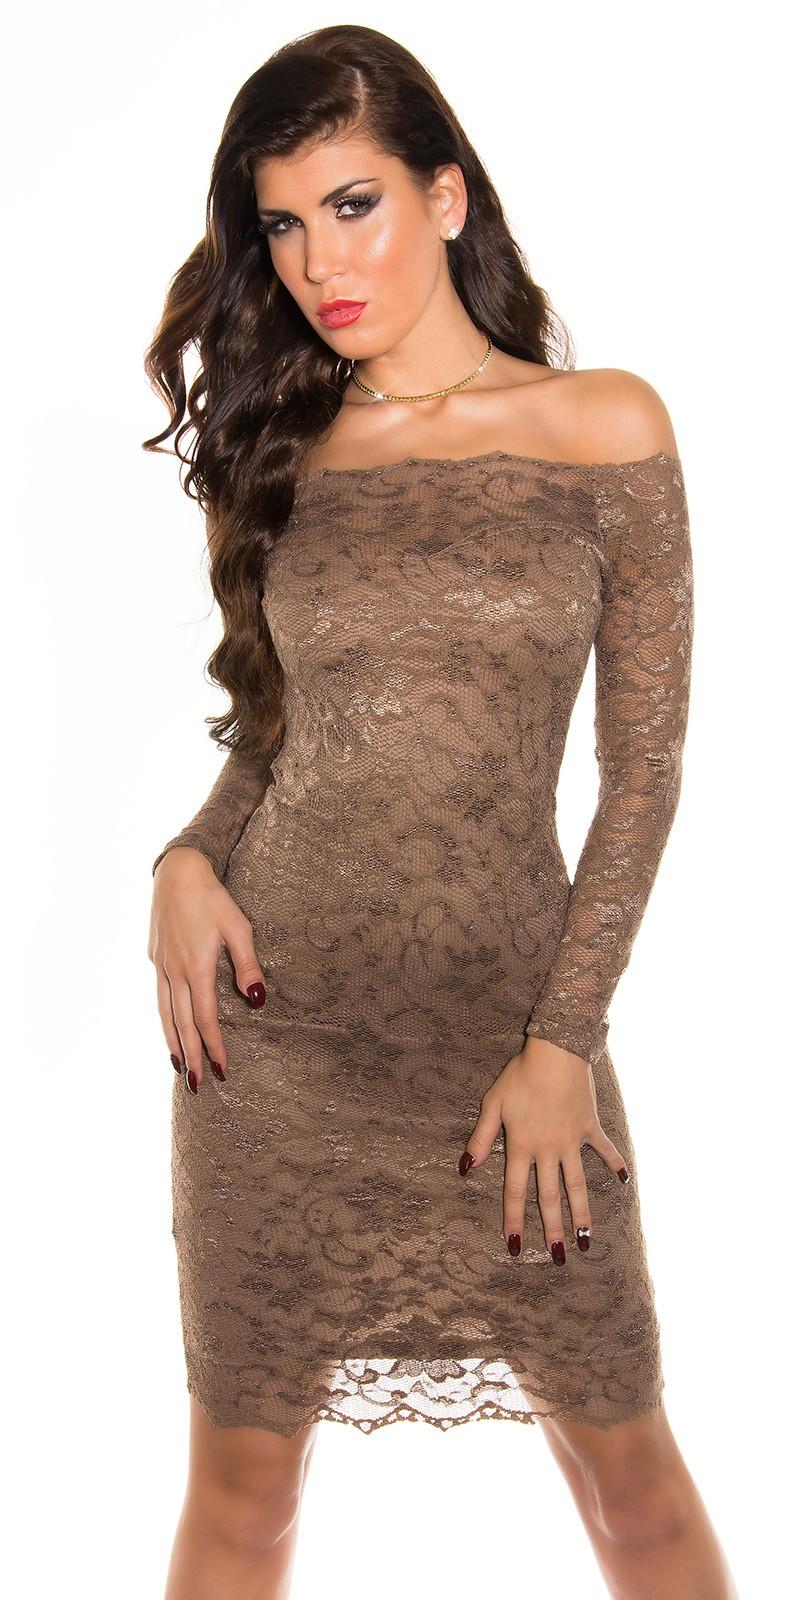 Csipke hosszú ujjú női ruha - Capuccino (38-40) empty 7a4b205f7d